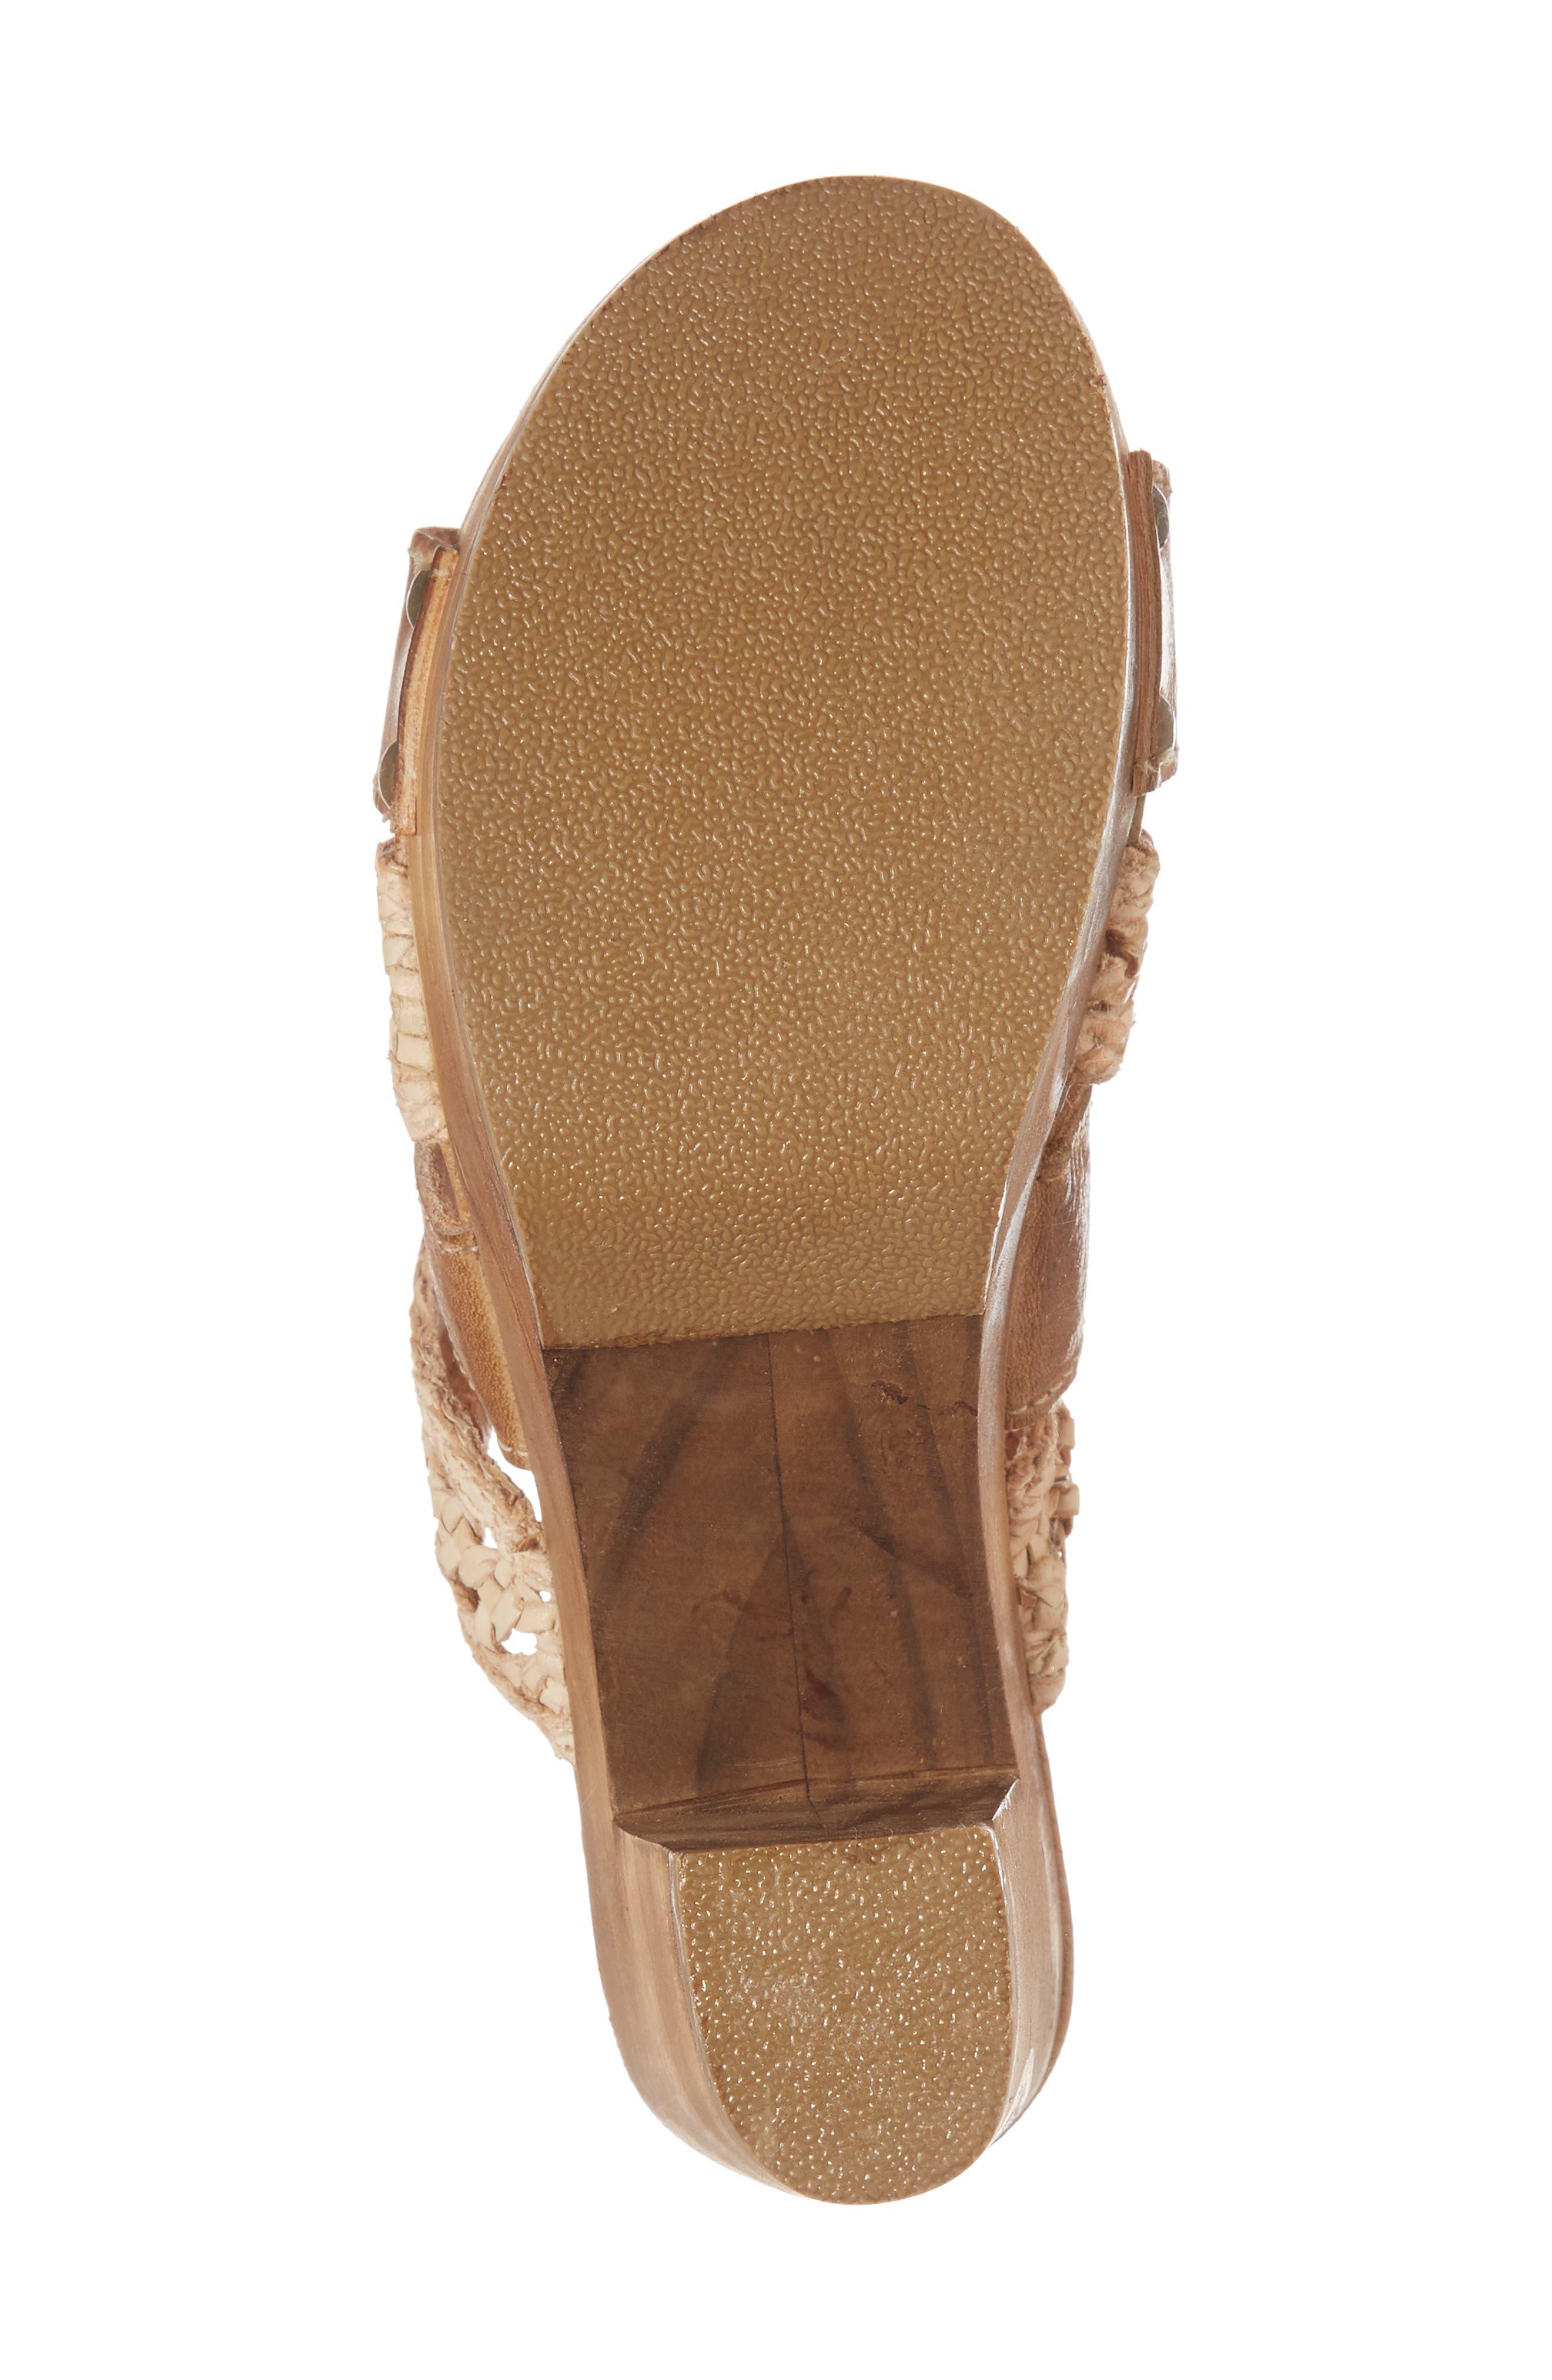 Crystal Platform Slide Sandal,                             Alternate thumbnail 6, color,                             TAN/ BONE LEATHER